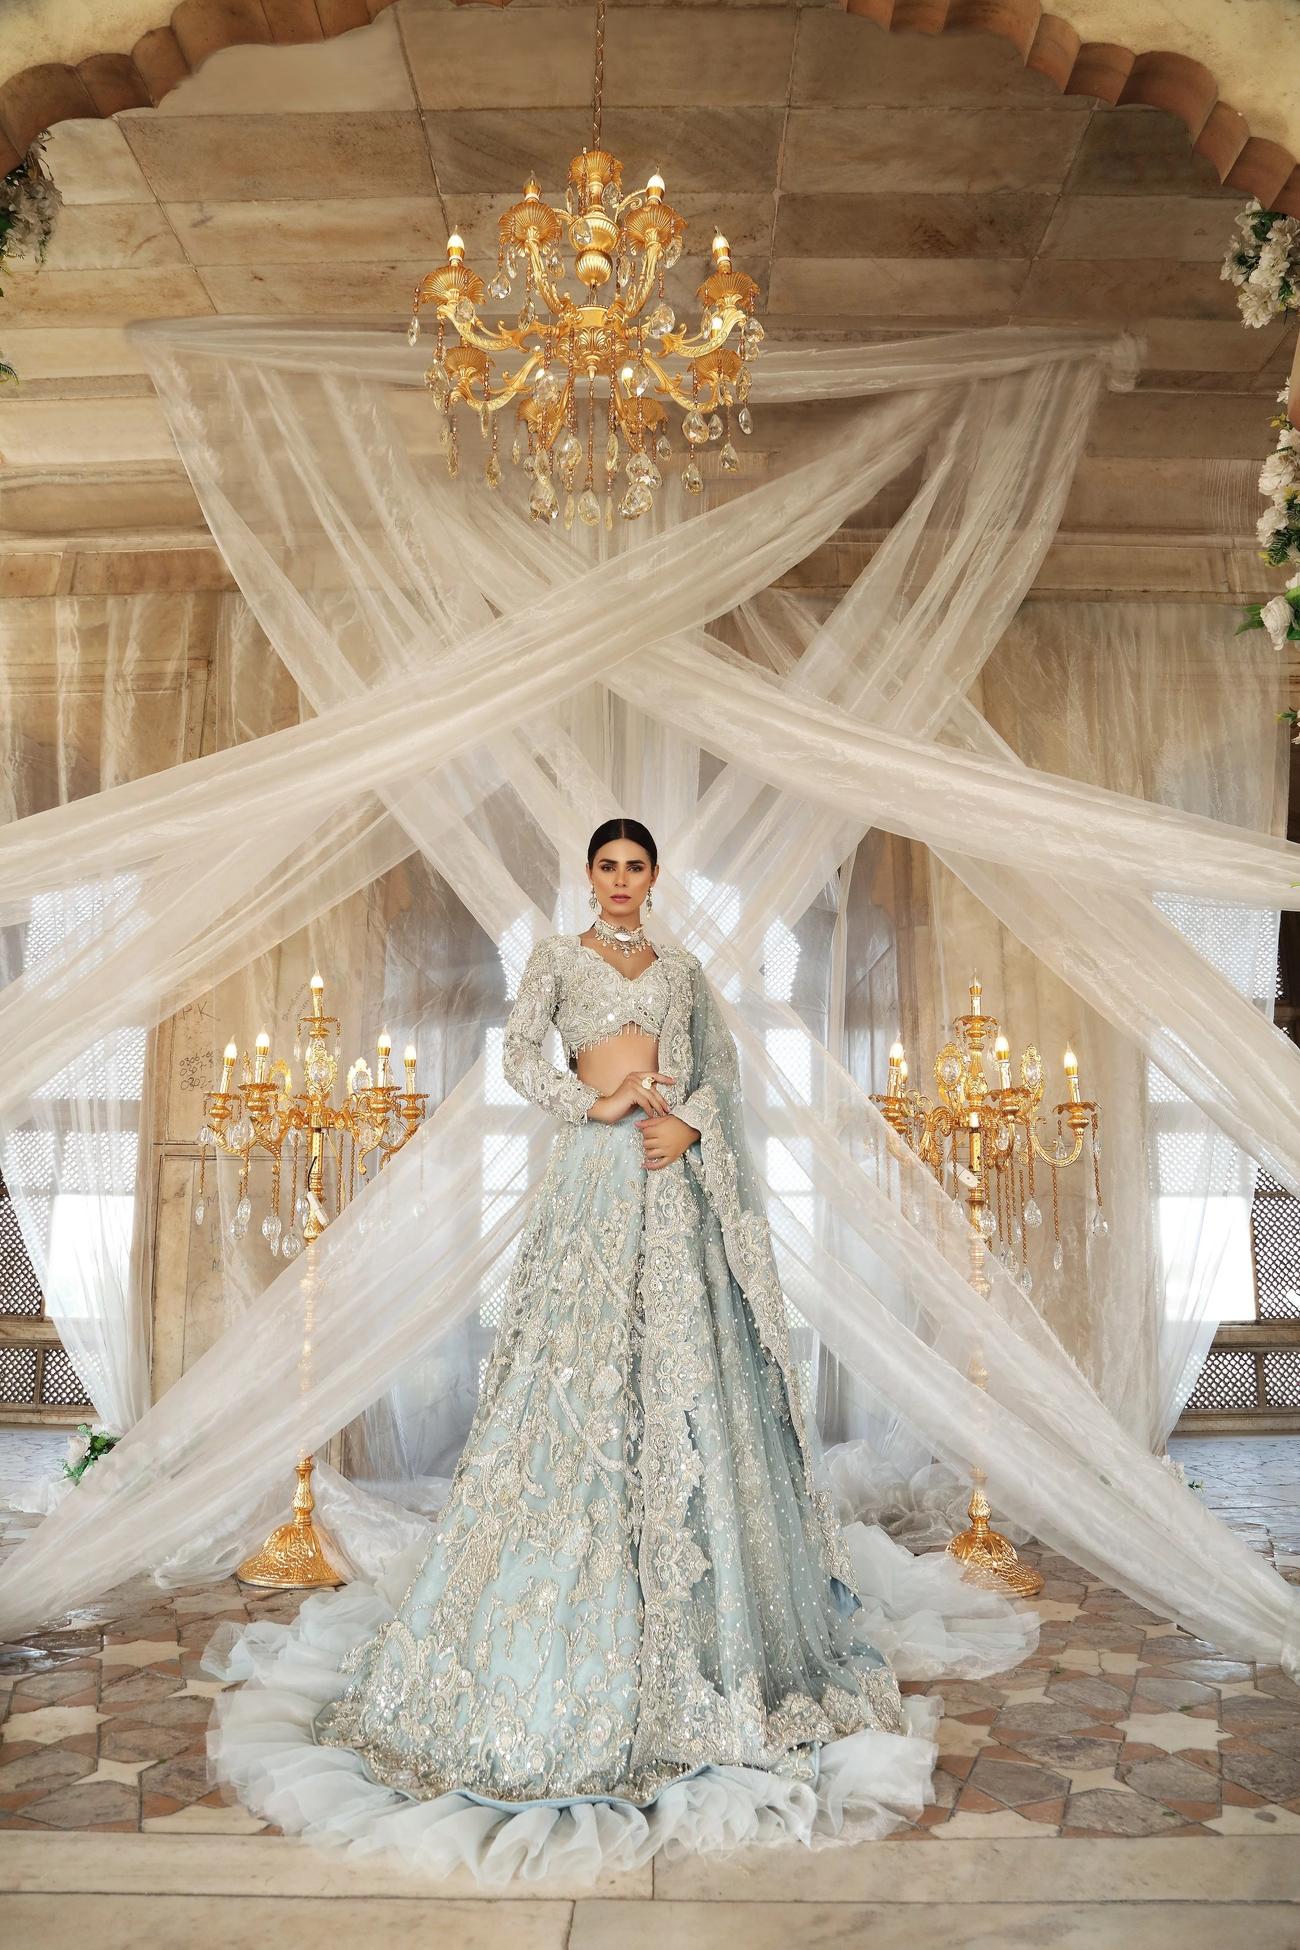 Erum Khan Bridal Dress On Walima Day Ice Blue color